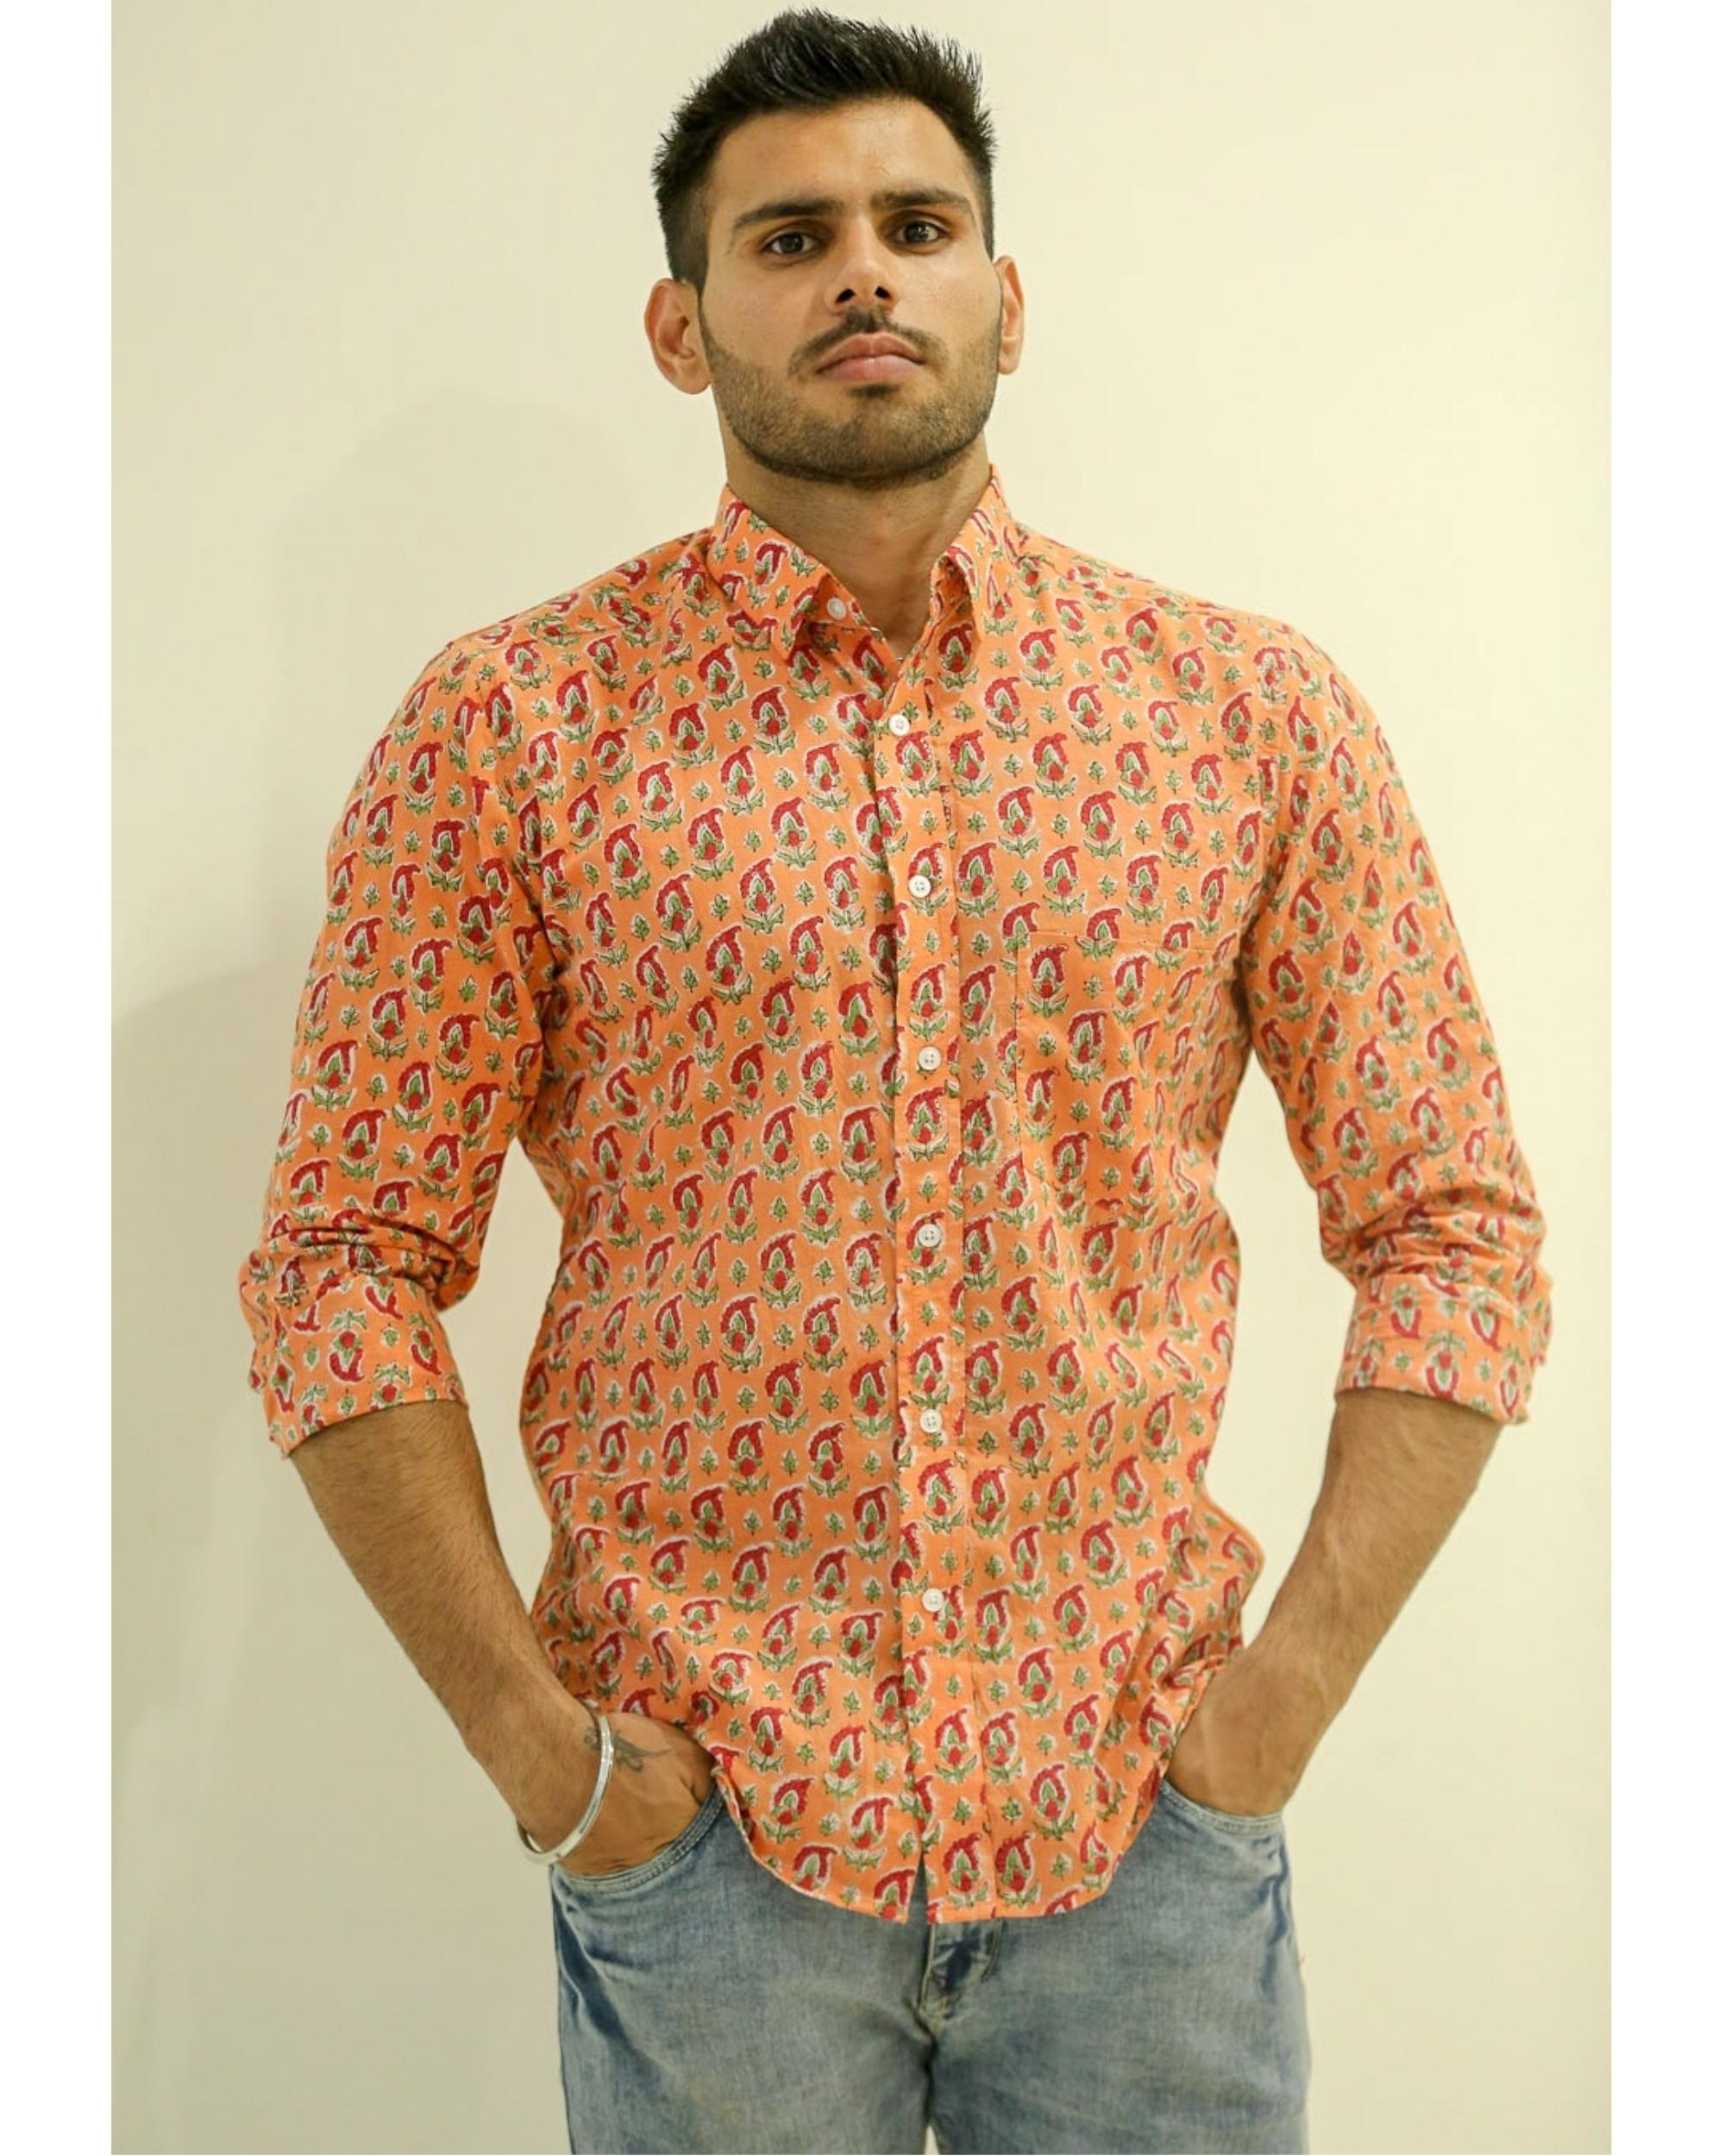 Peach Paisley Printed Shirt